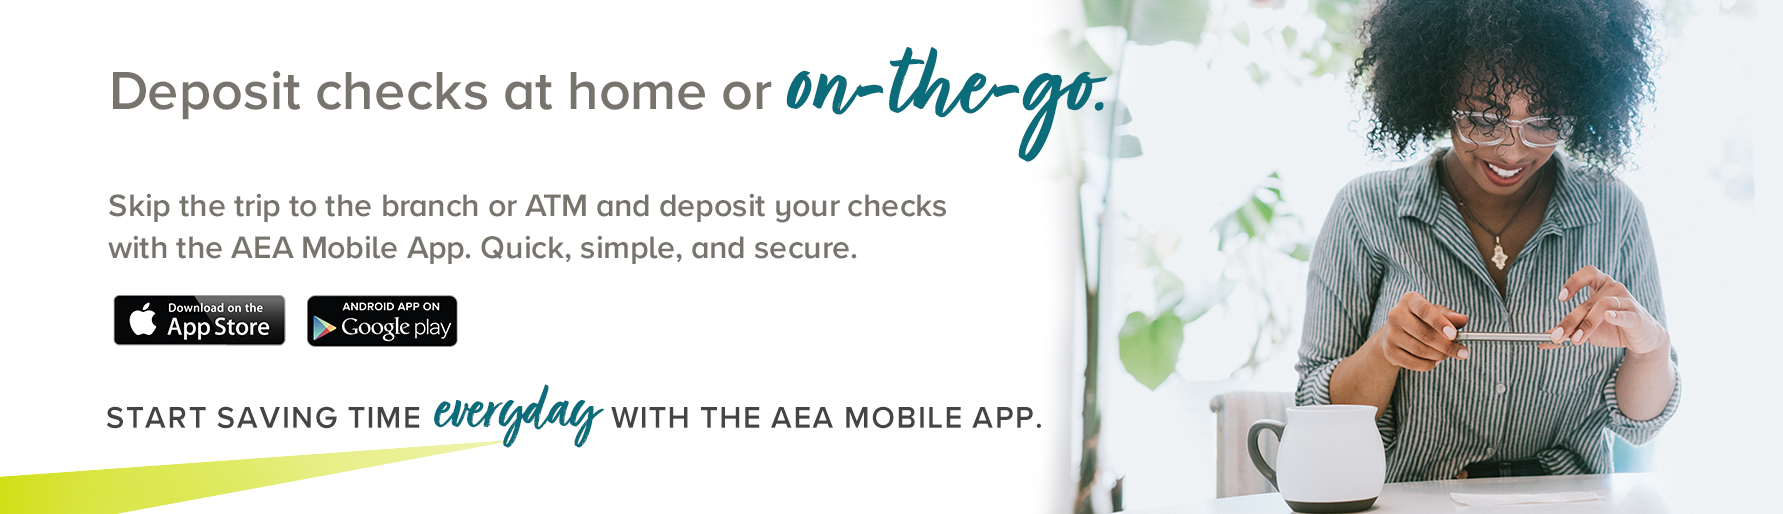 Mobile Deposit. Deposit checks at home or on the go